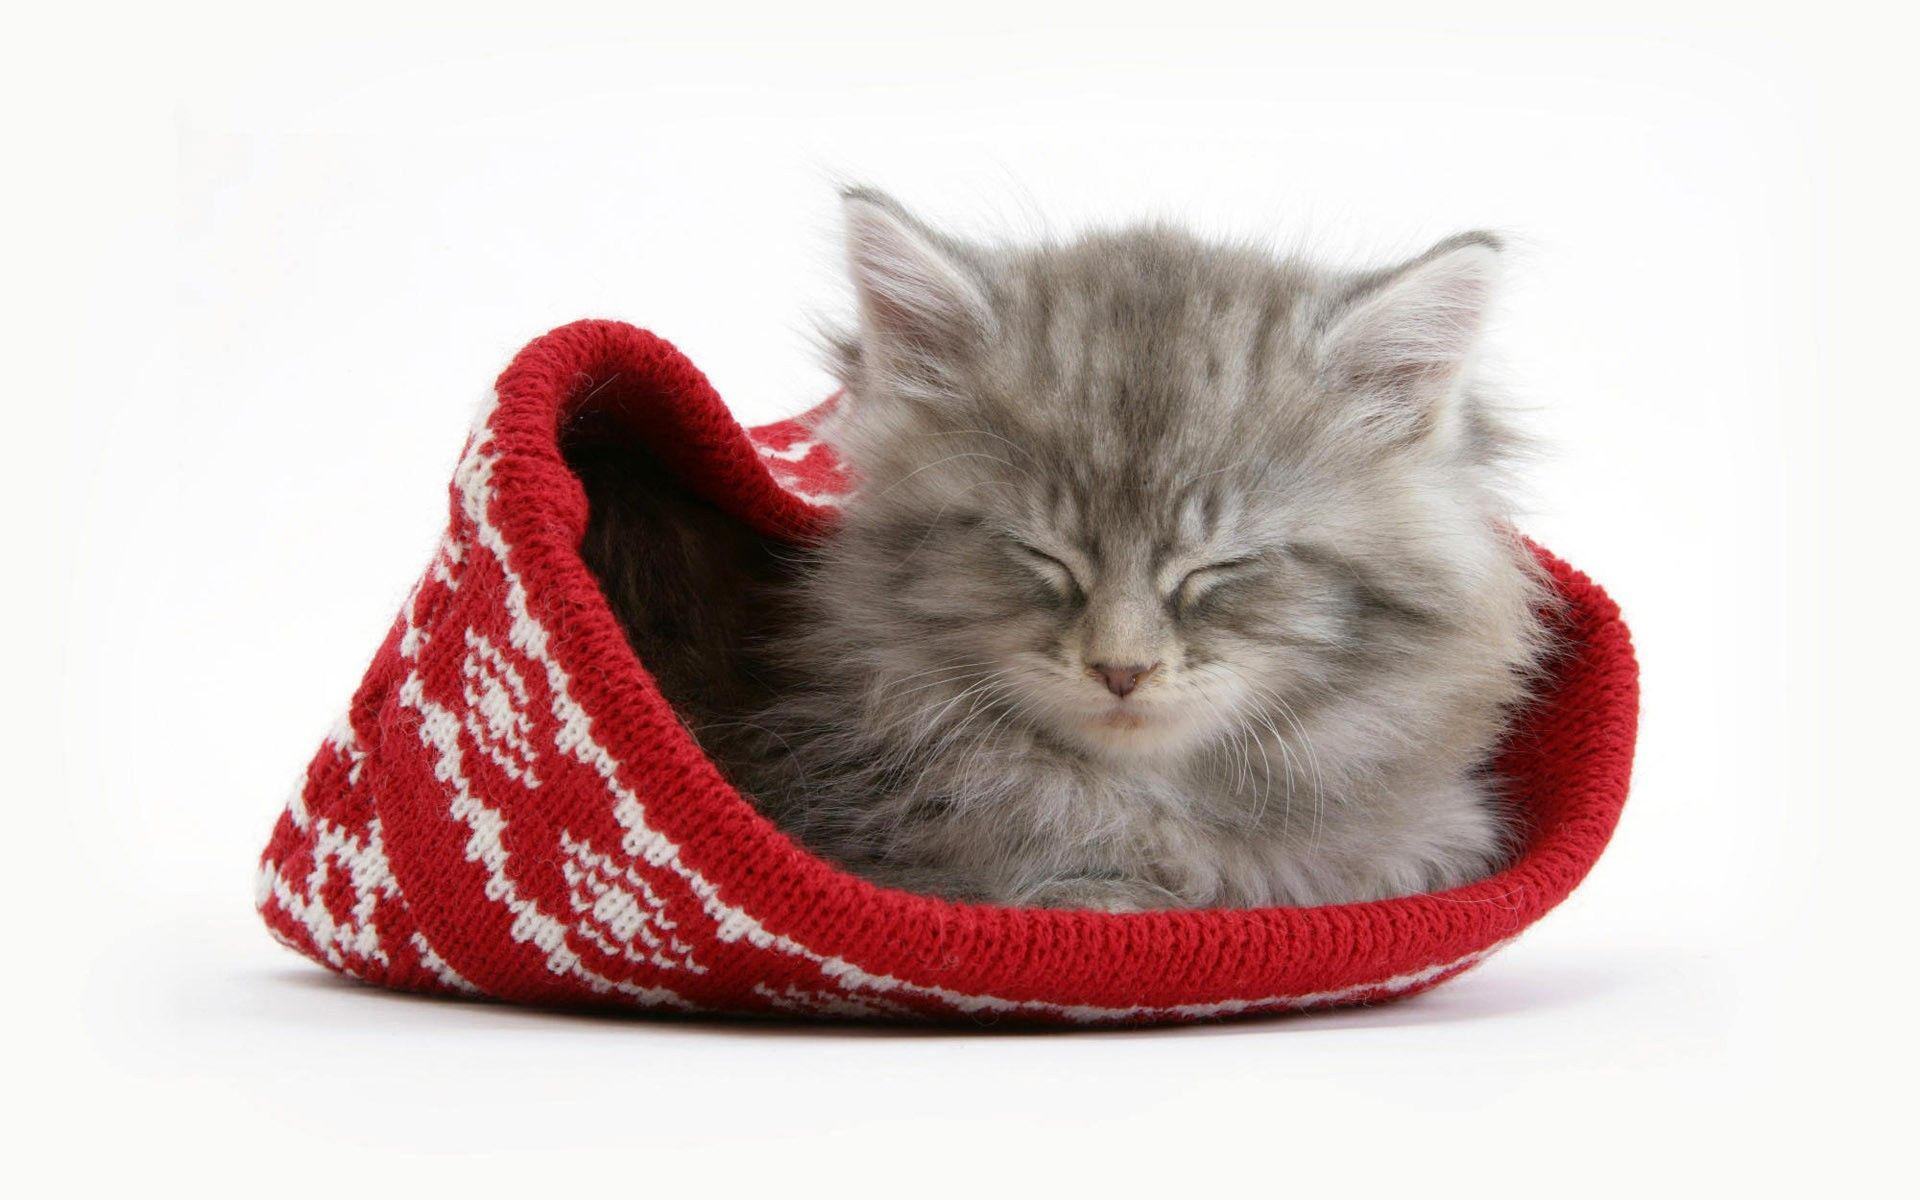 Fond Ecran Chat Noel Cute Kittens Chaton Gris Chatons Duveteux